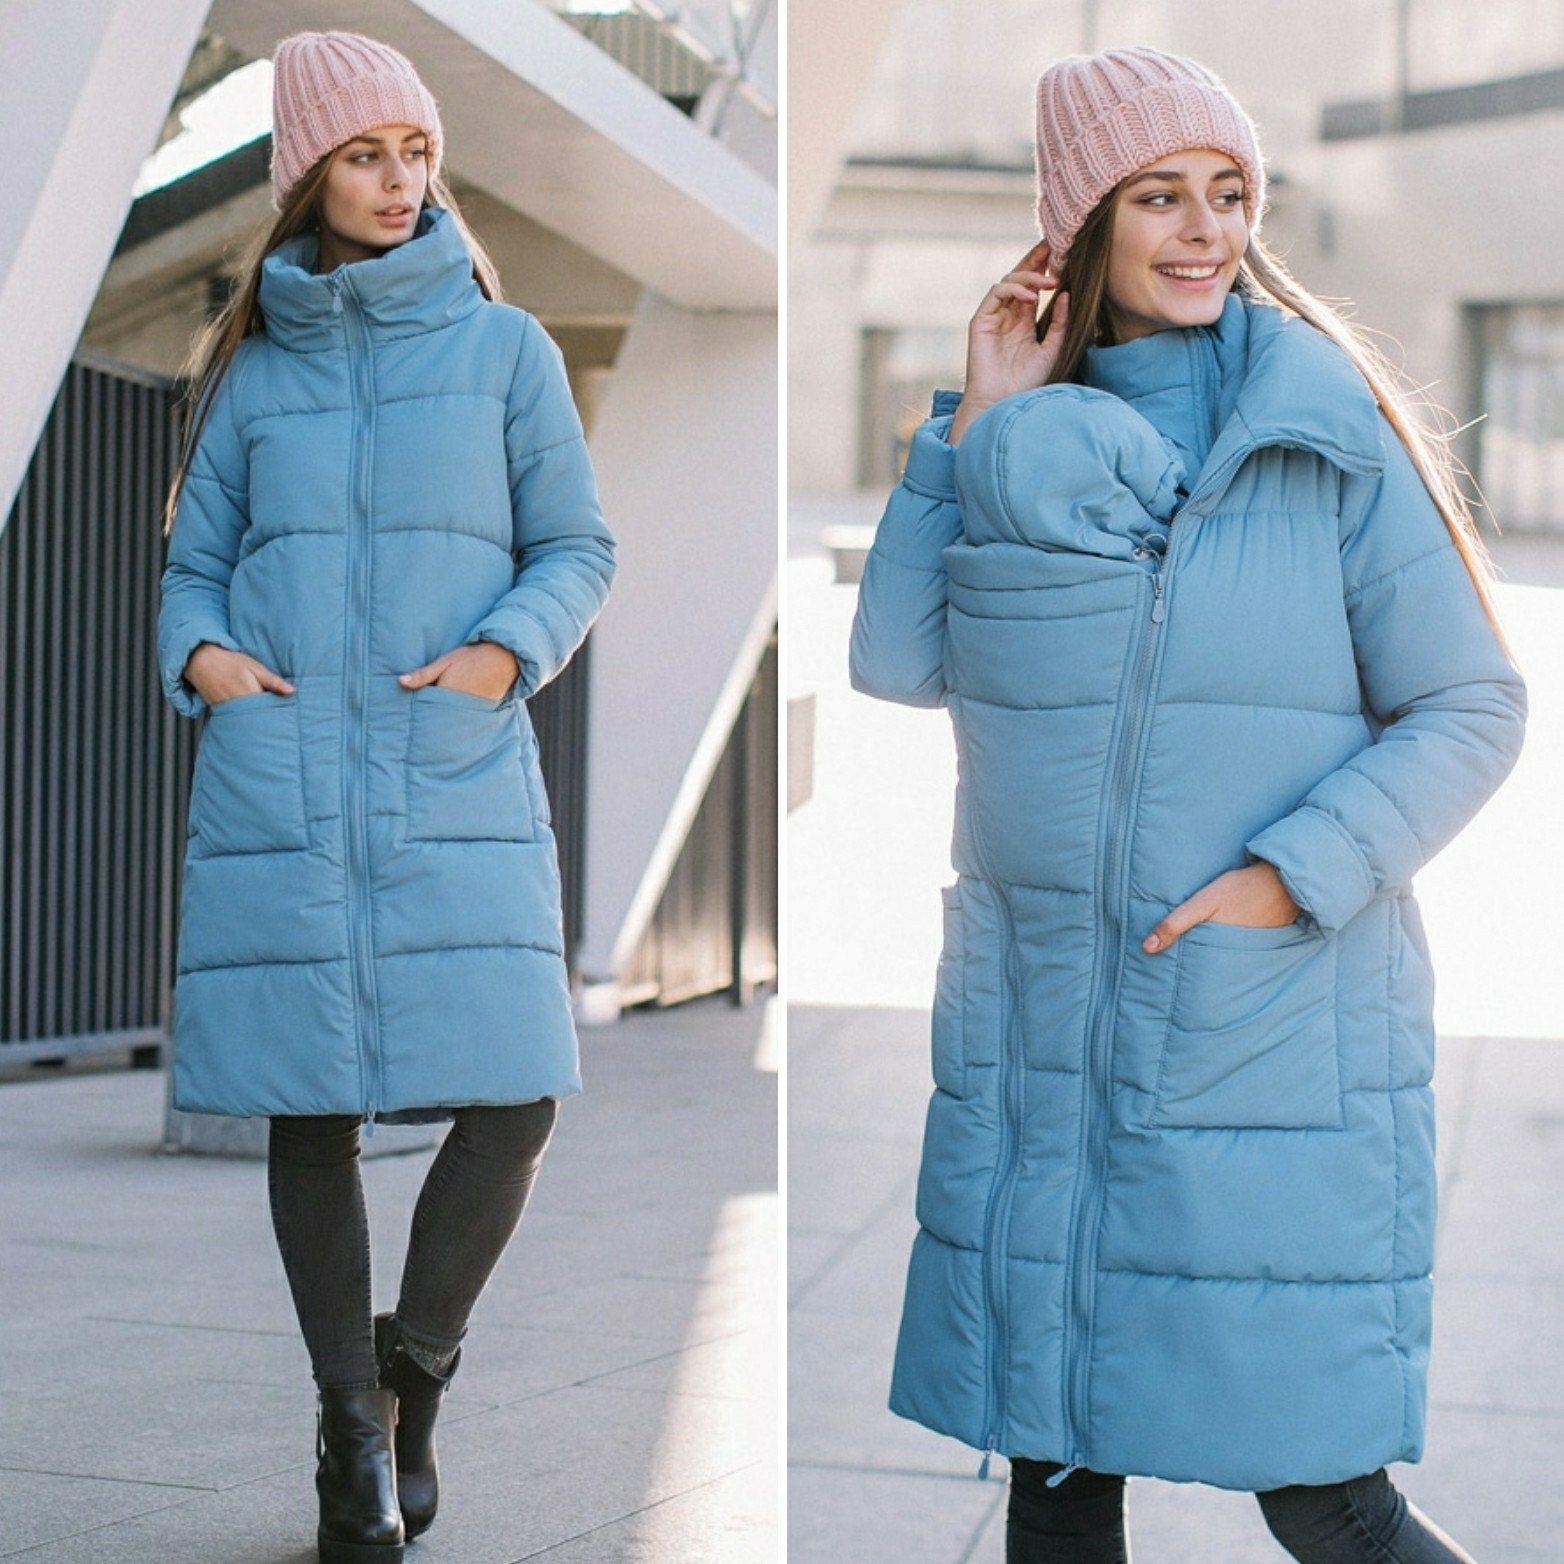 Mom Warm coat baby carrier Winter Babywearing jacket Baby wearing winter coat 4-in-1 Maternity down coat Winter maternity coat Belly to baby